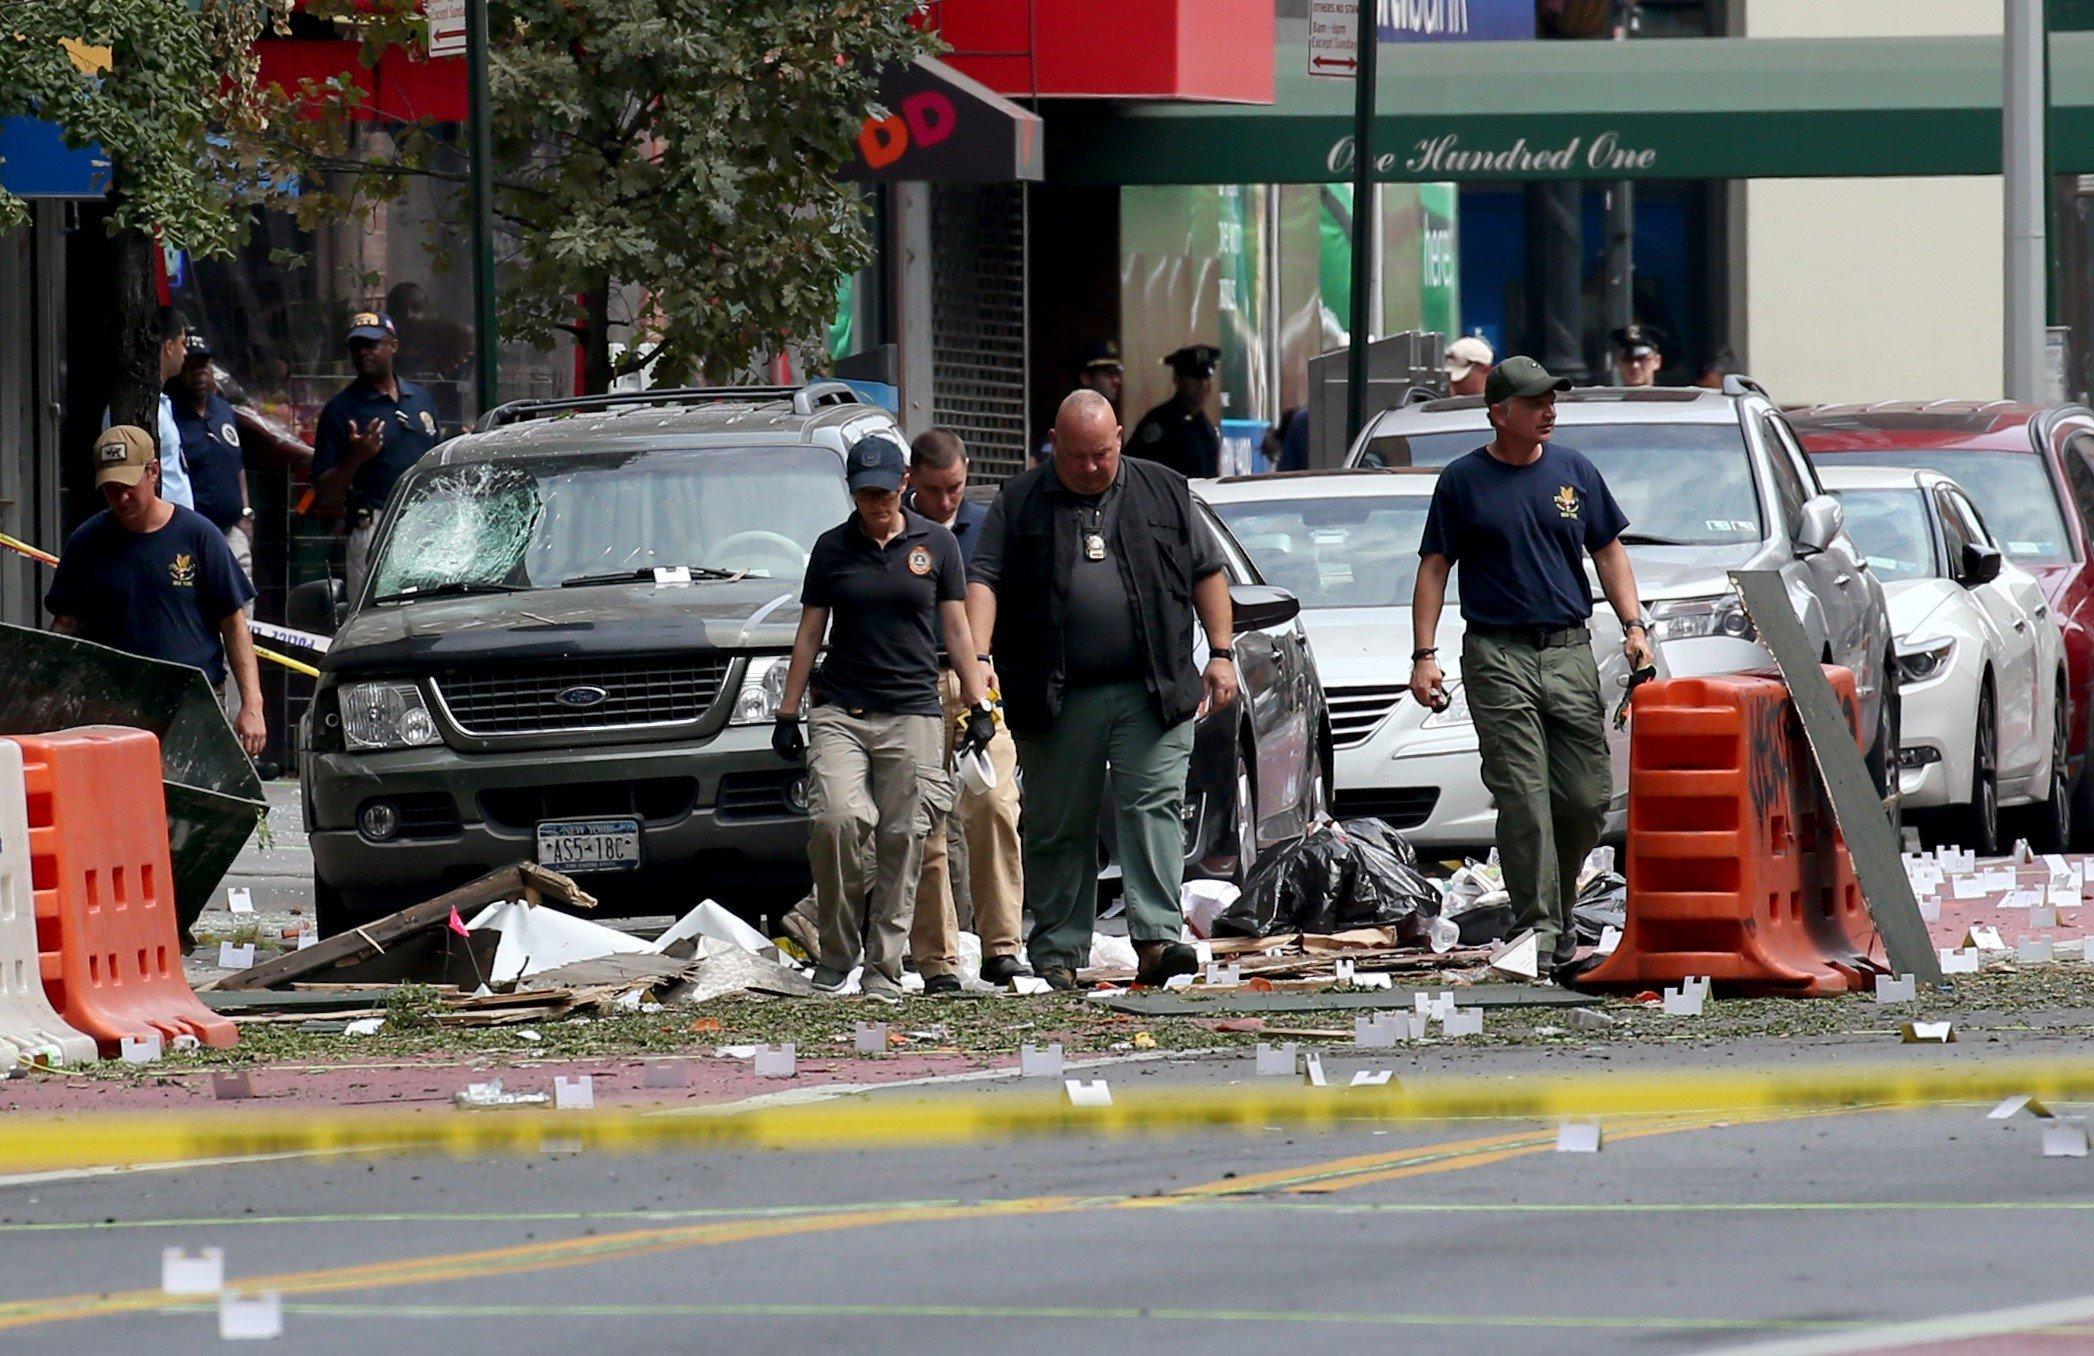 FBI investigators examine rubble at the bomb